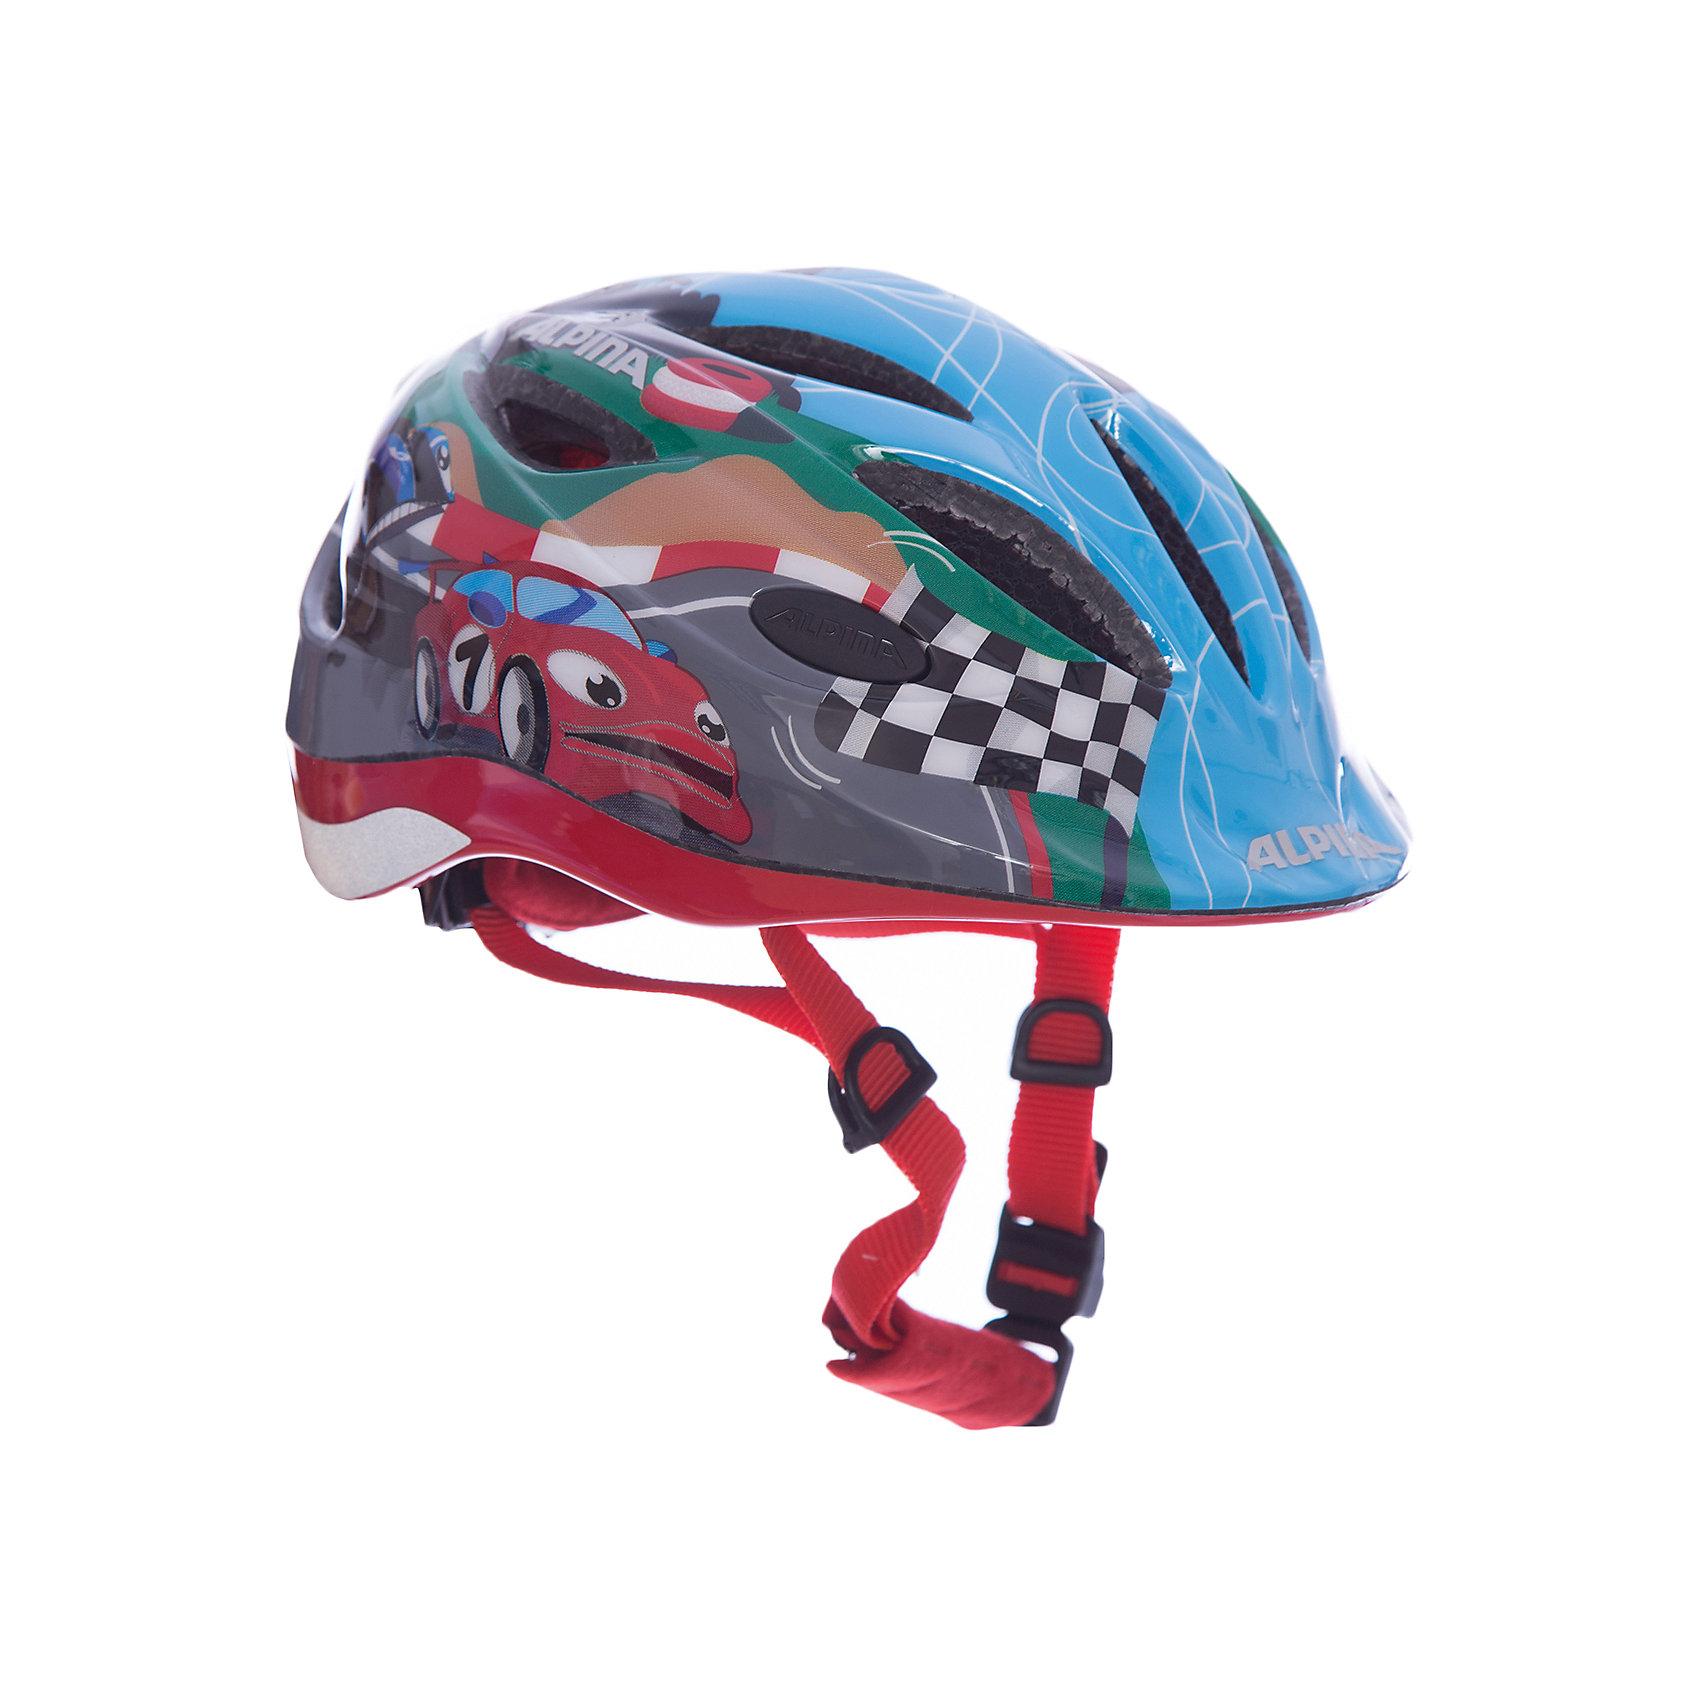 Летний шлем ALPINA Gamma 2.0 Flash racingЗащита, шлемы<br><br><br>Ширина мм: 295<br>Глубина мм: 231<br>Высота мм: 170<br>Вес г: 522<br>Цвет: mehrfarbig<br>Возраст от месяцев: 36<br>Возраст до месяцев: 120<br>Пол: Мужской<br>Возраст: Детский<br>Размер: 51-56,46-51<br>SKU: 4467443